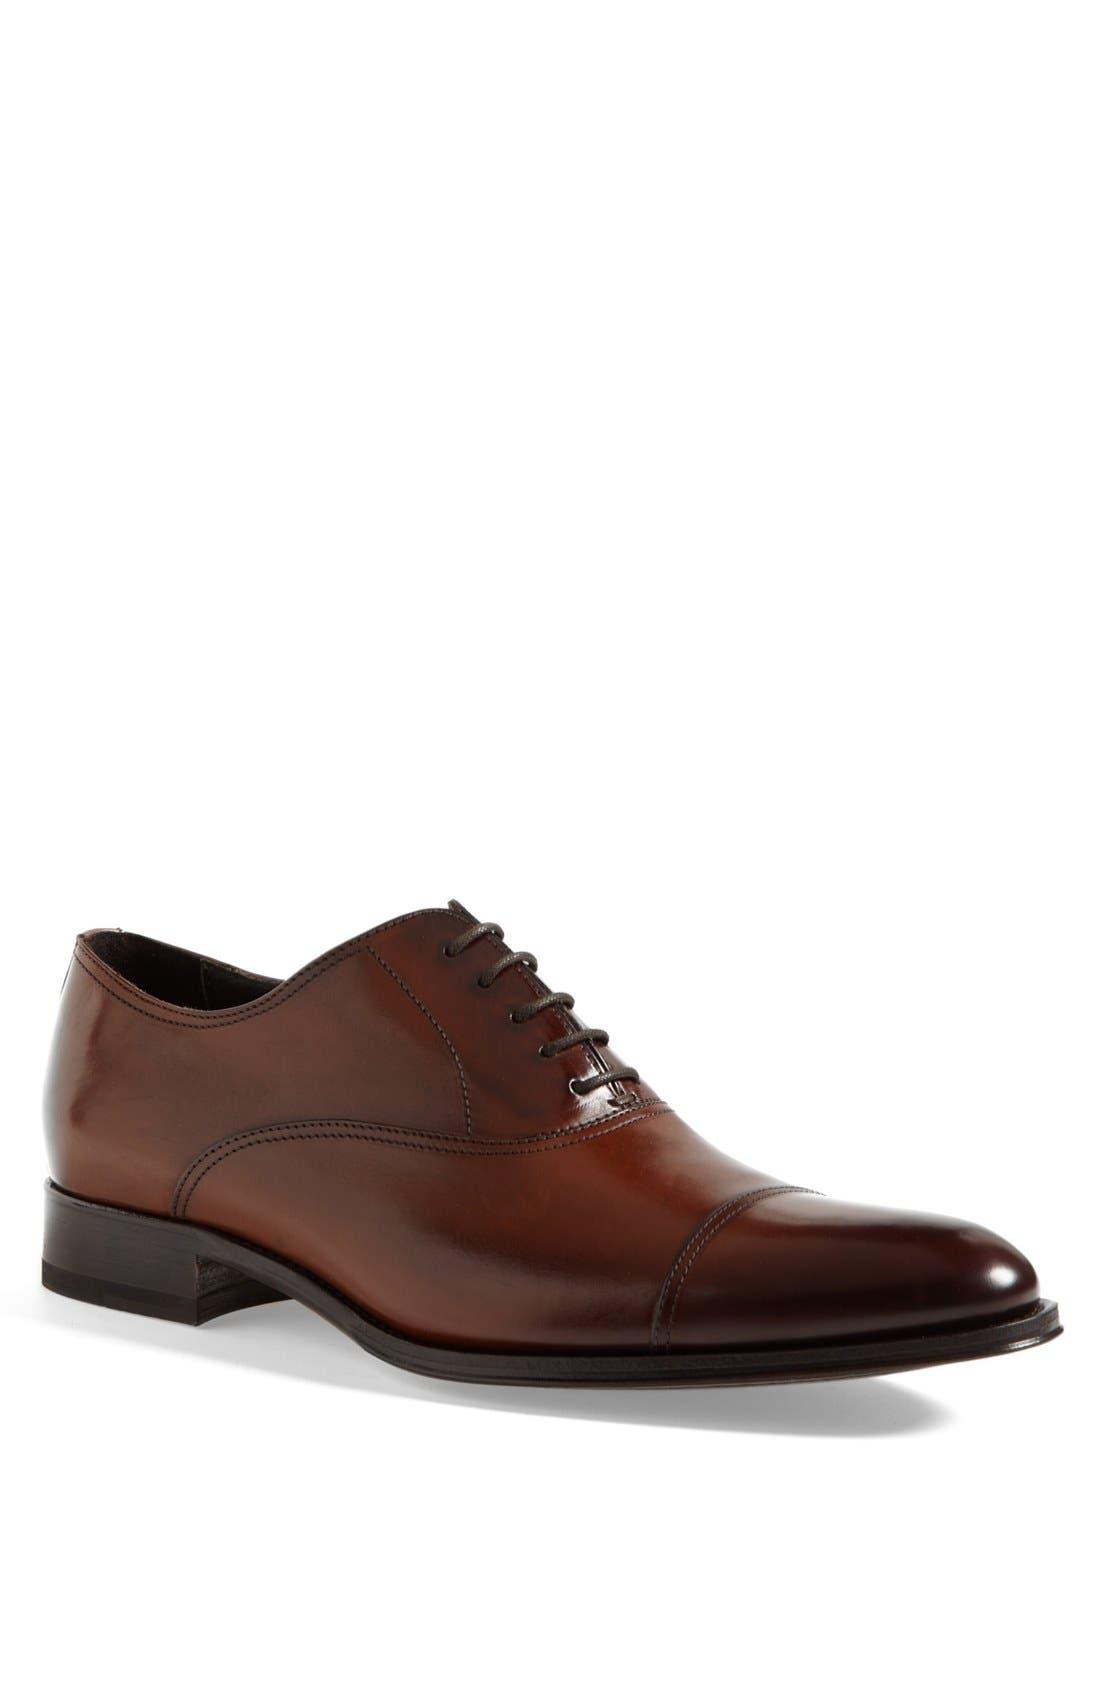 men\u0027s oxfords \u0026 derby shoes nordstrom  to boot new york brandon cap toe oxford (nordstrom exclusive) (men)